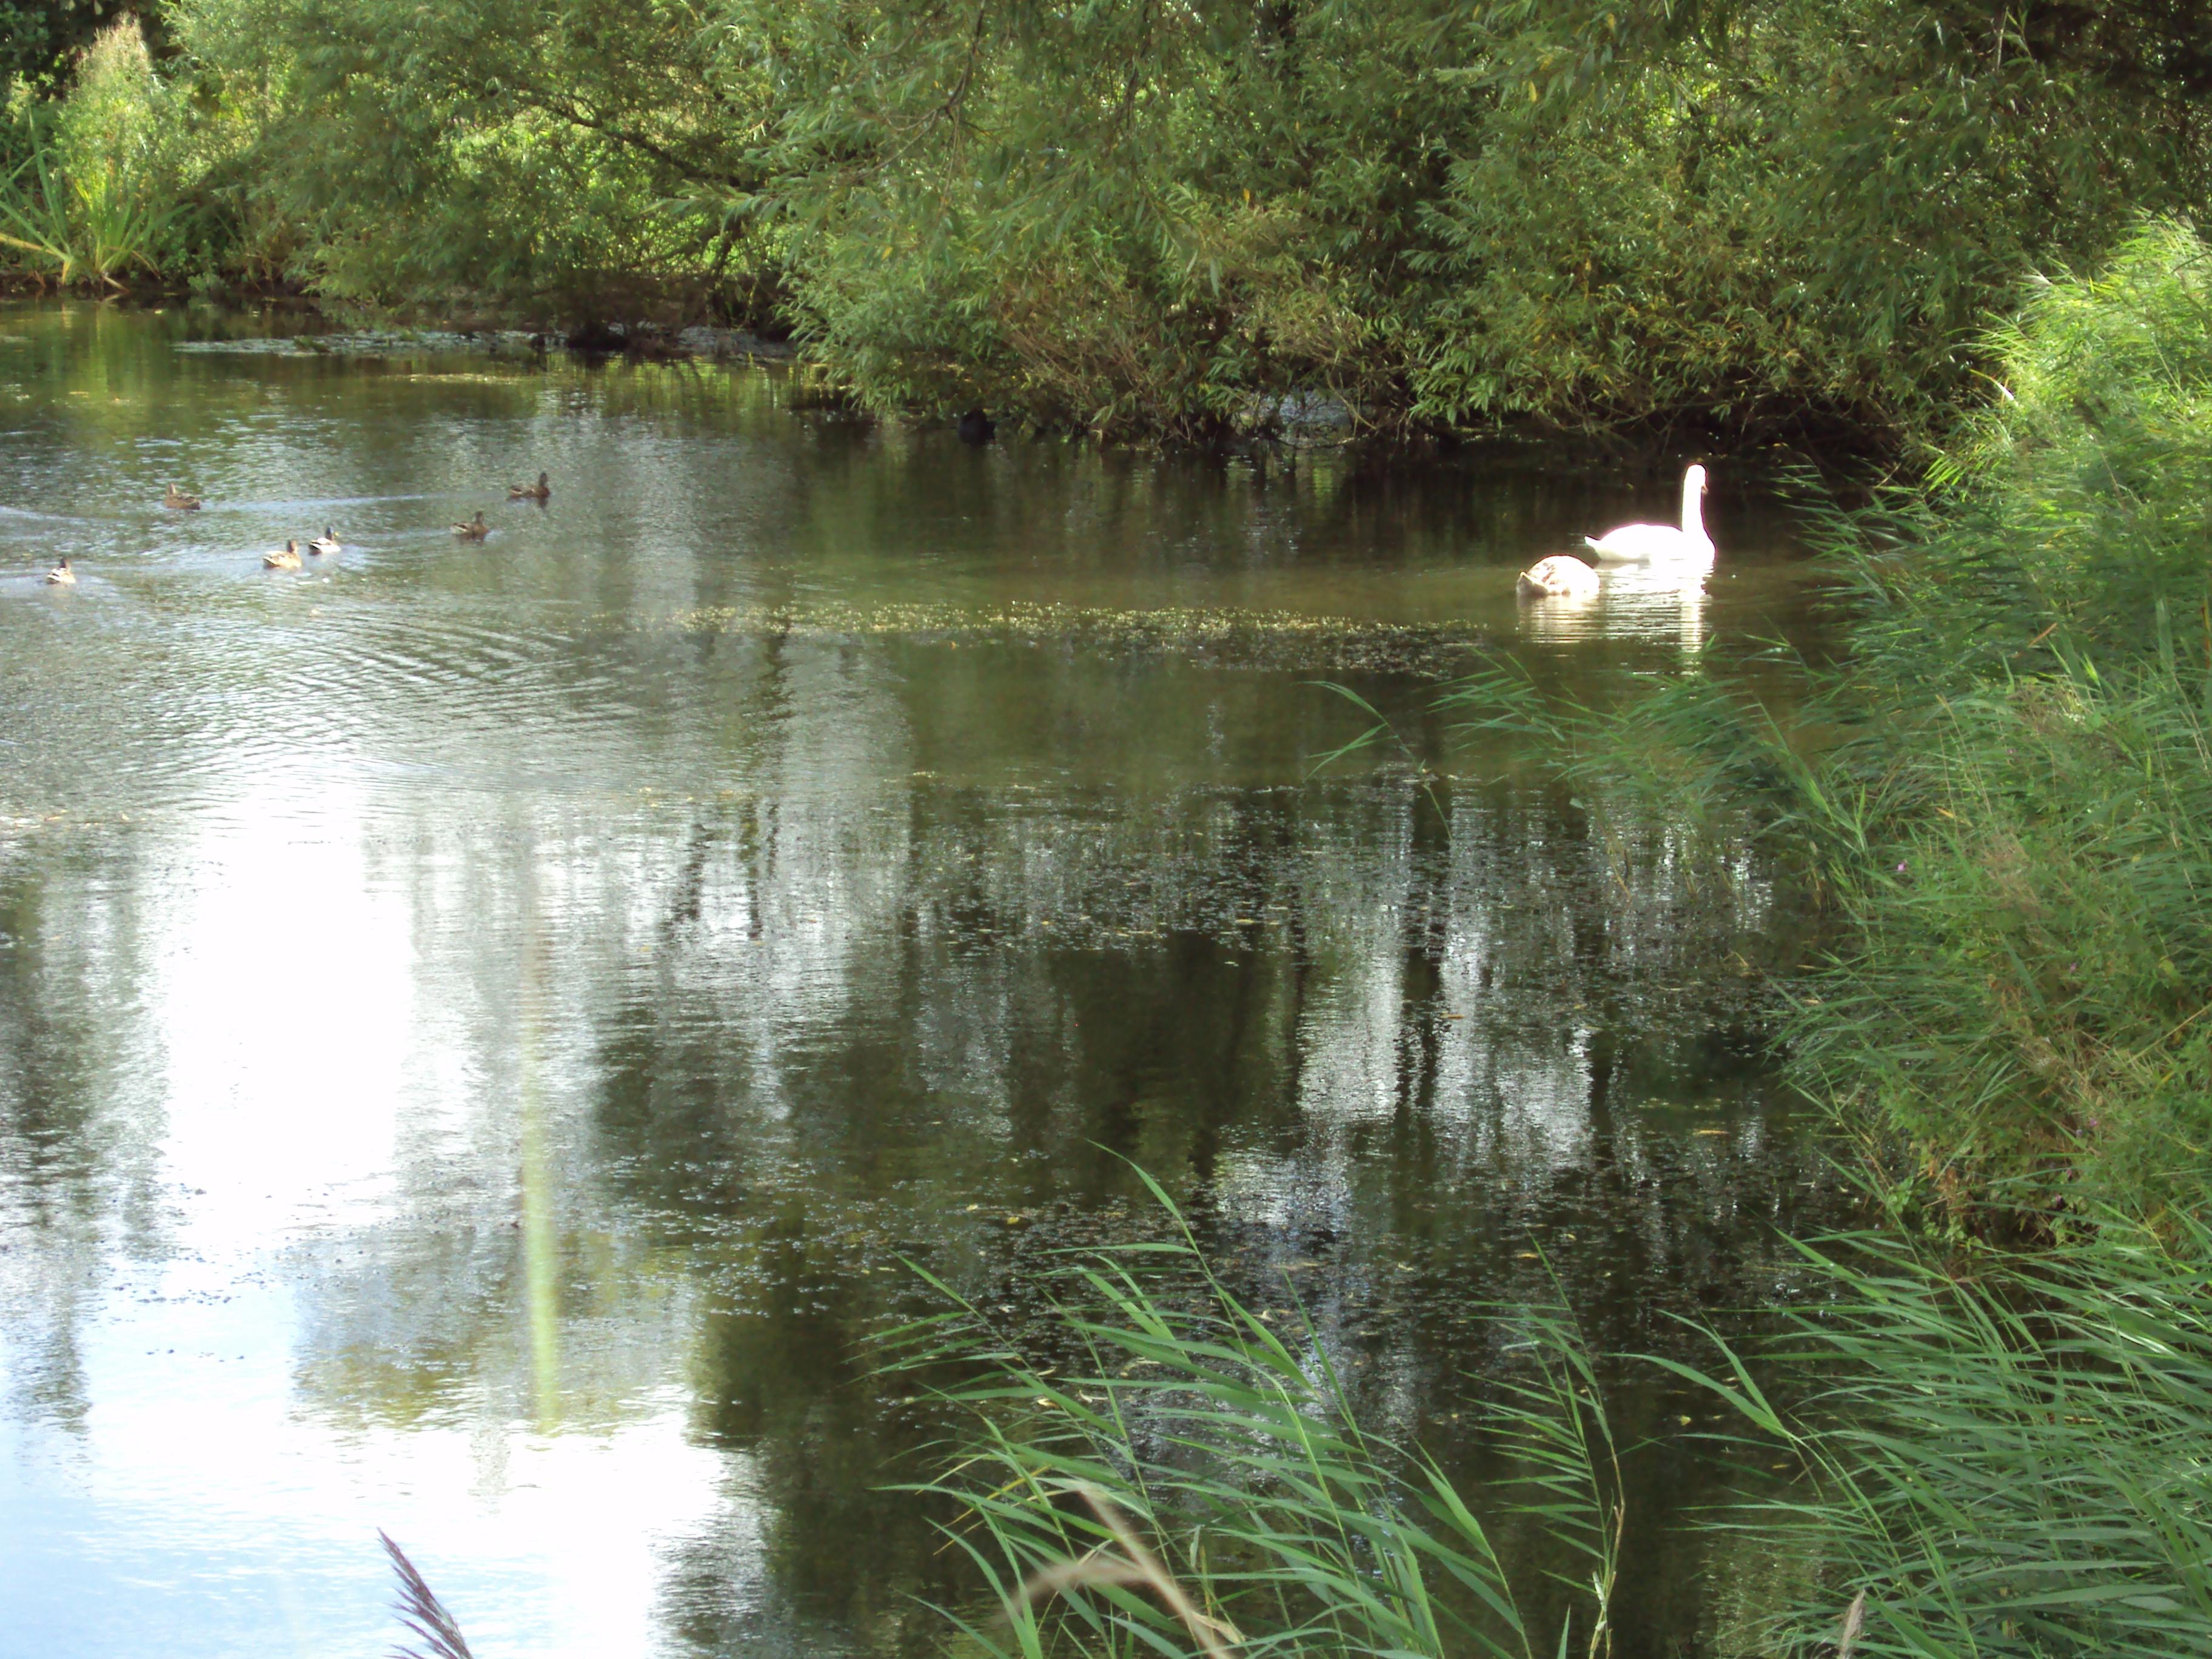 File:Fishing pond, Meols.JPG - Wikimedia Commons